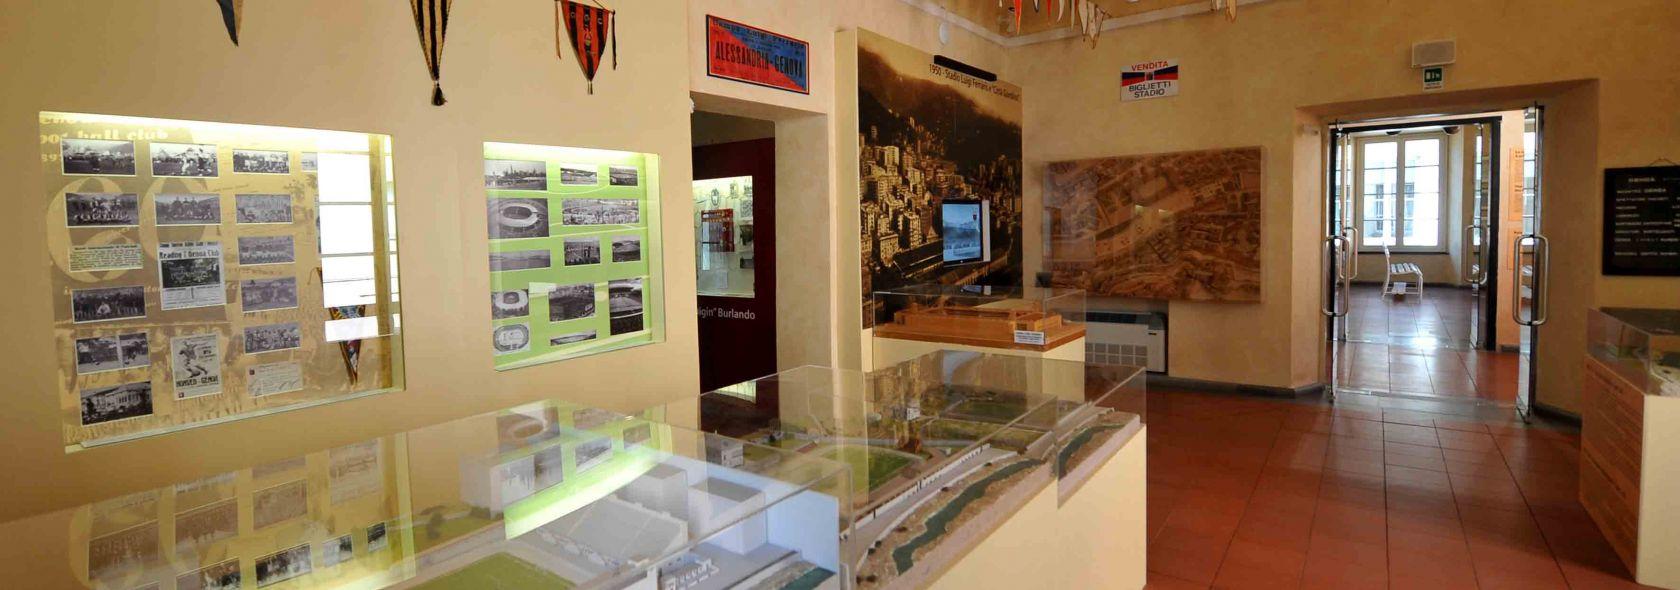 Museo della Storia del Genoa - I campi